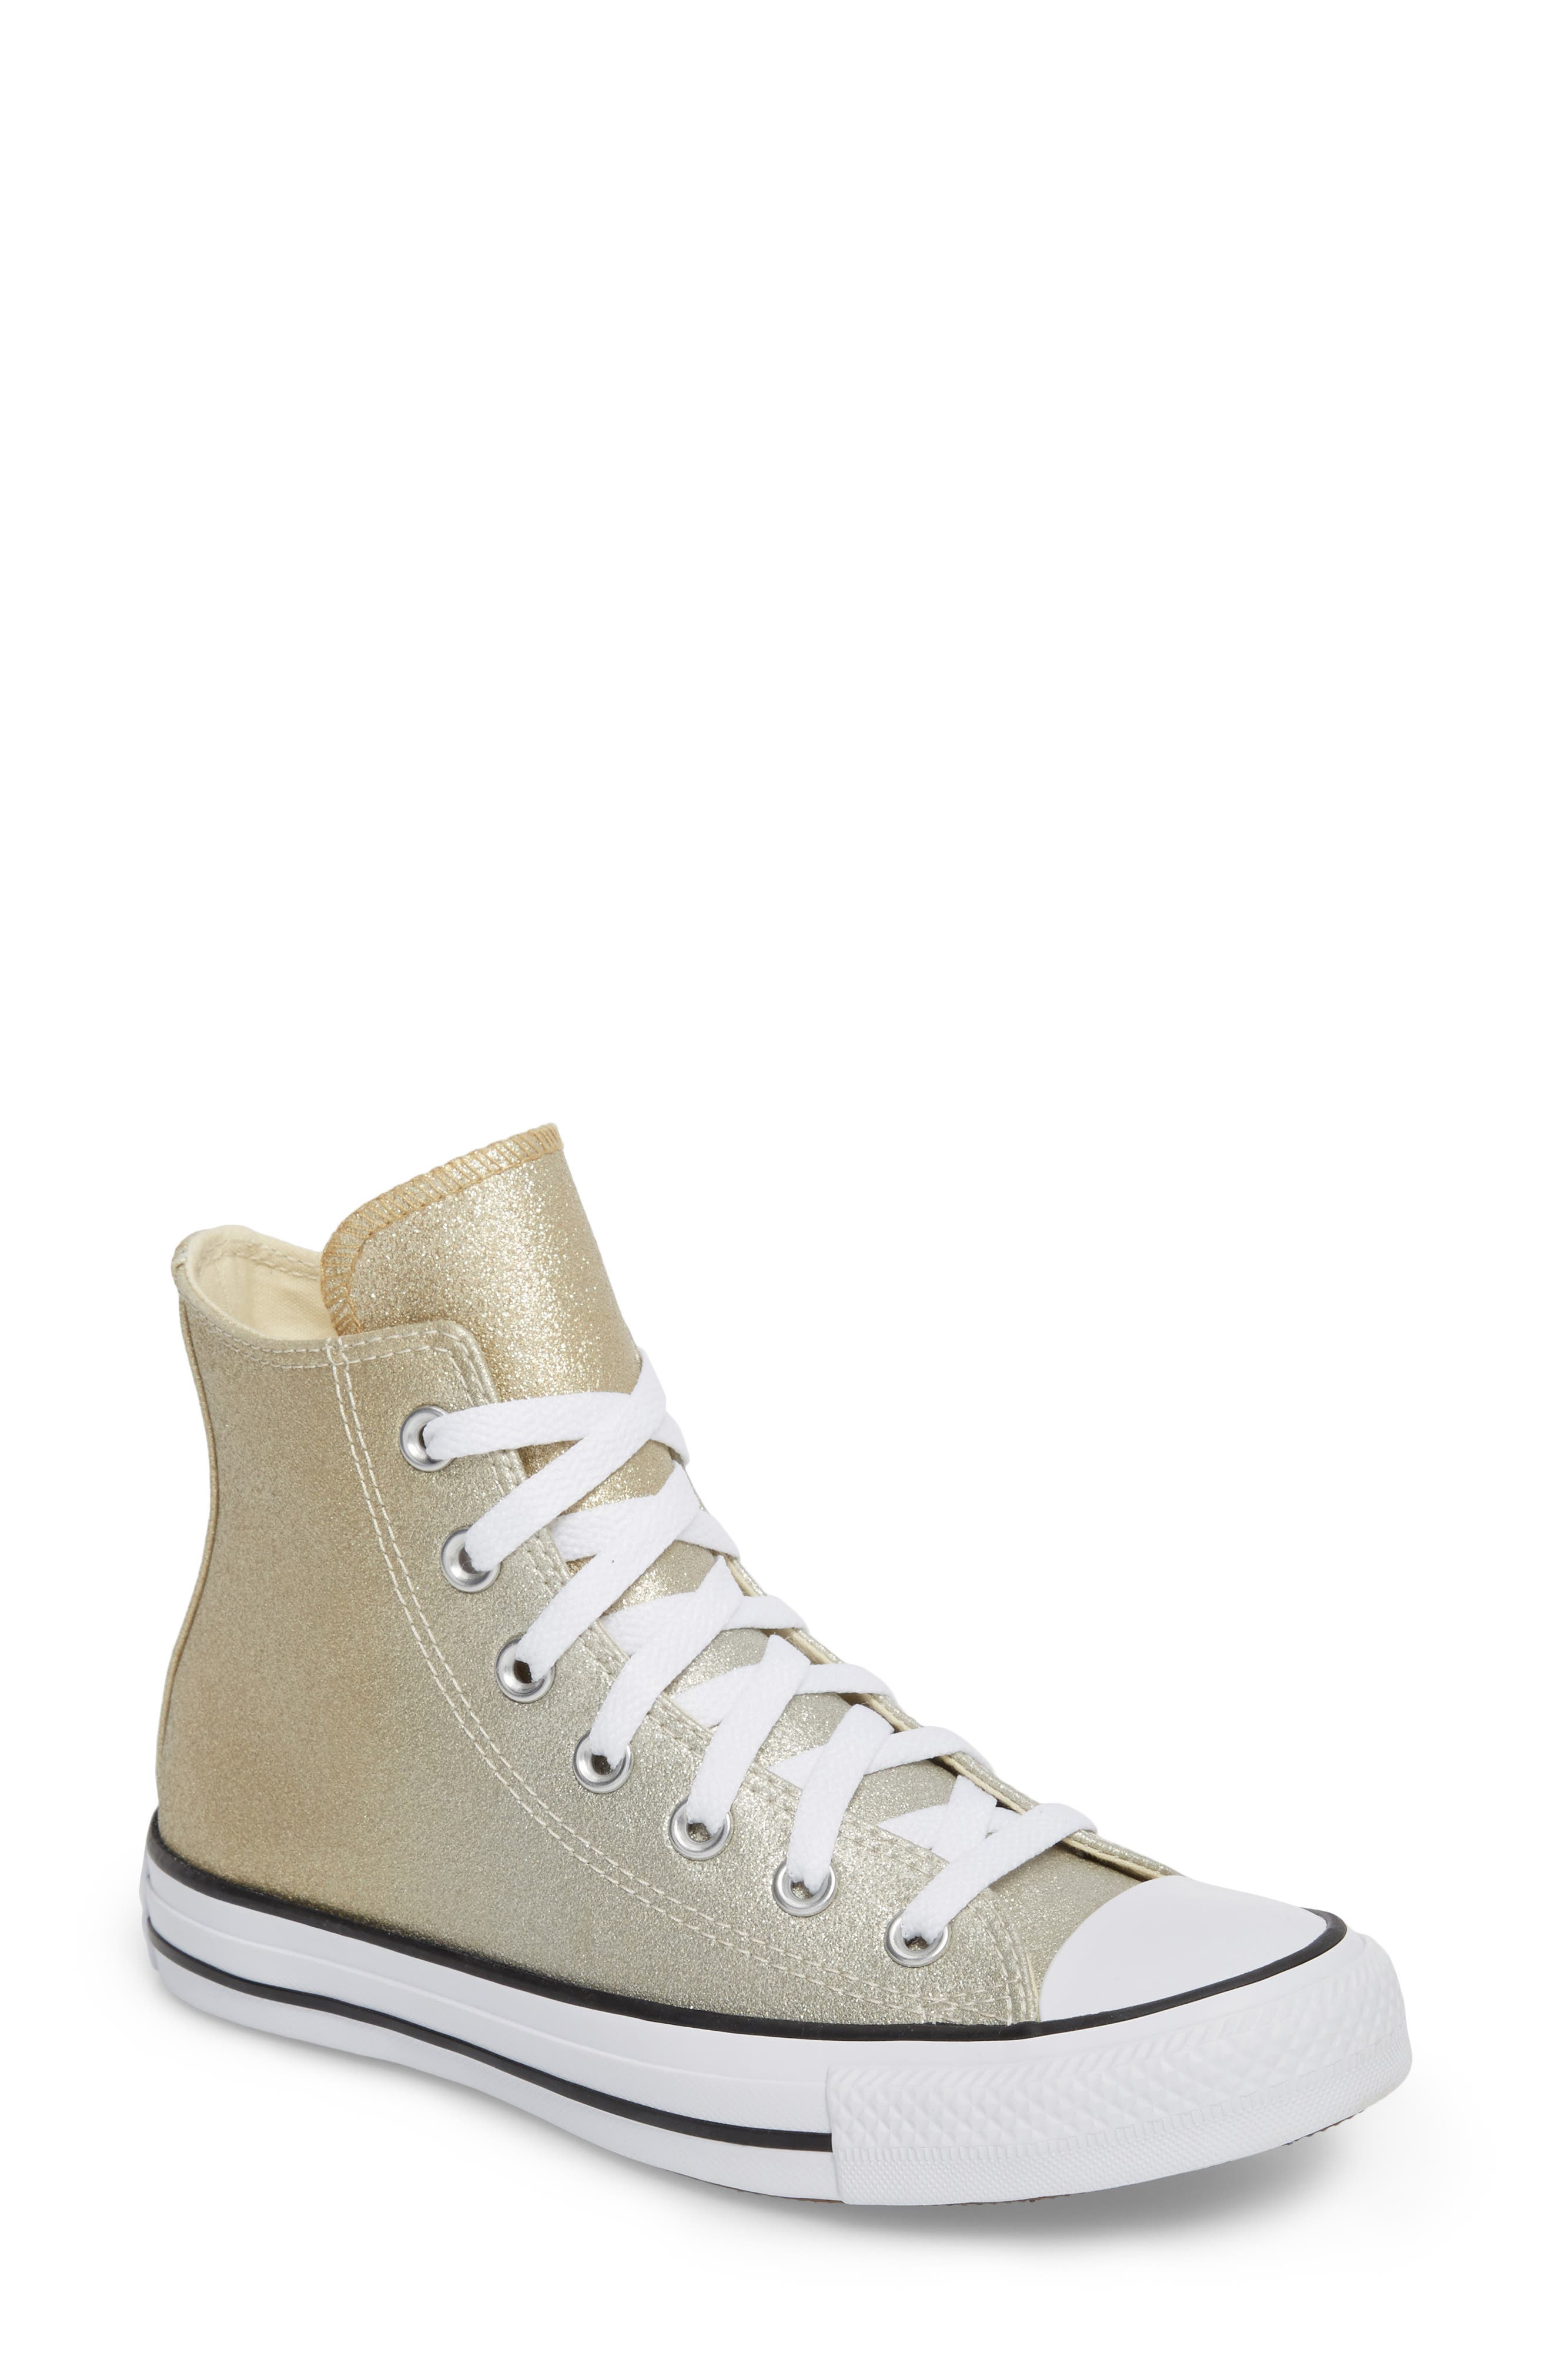 Main Image - Converse Chuck Taylor® All Star® Ombré Metallic High Top Sneaker (Women)